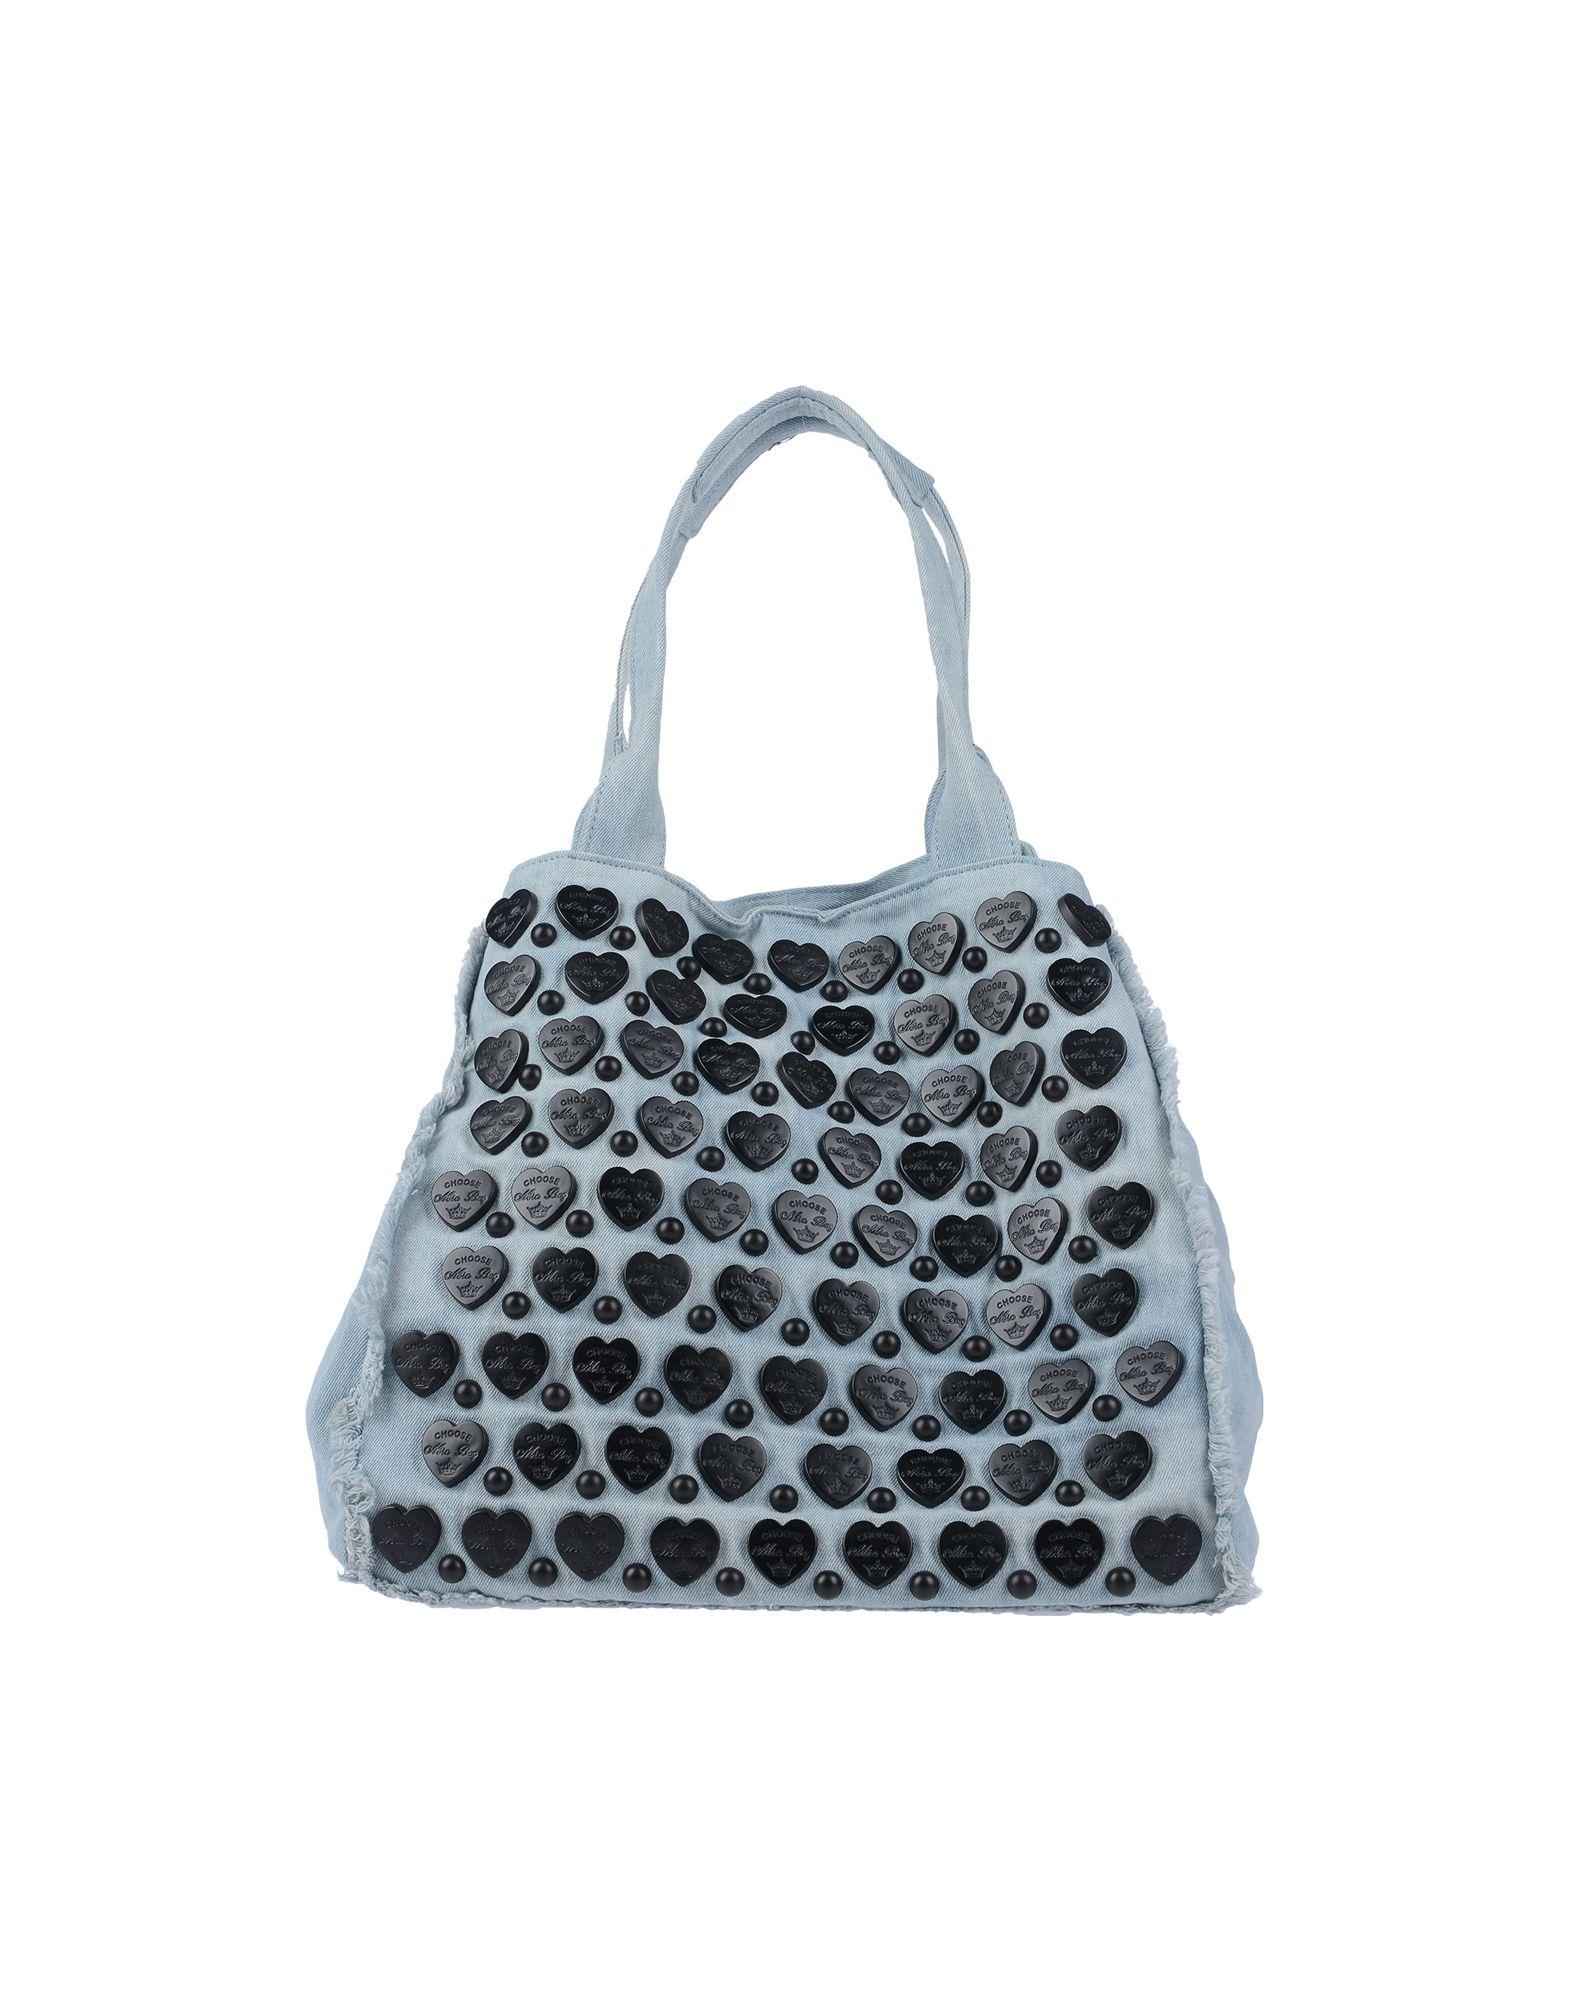 Фото - MIA BAG Сумка на руку cow leather tote bag brand 2018 bolsa feminina new women handbag 100% genuine leather alligator shoulder bag free shipping